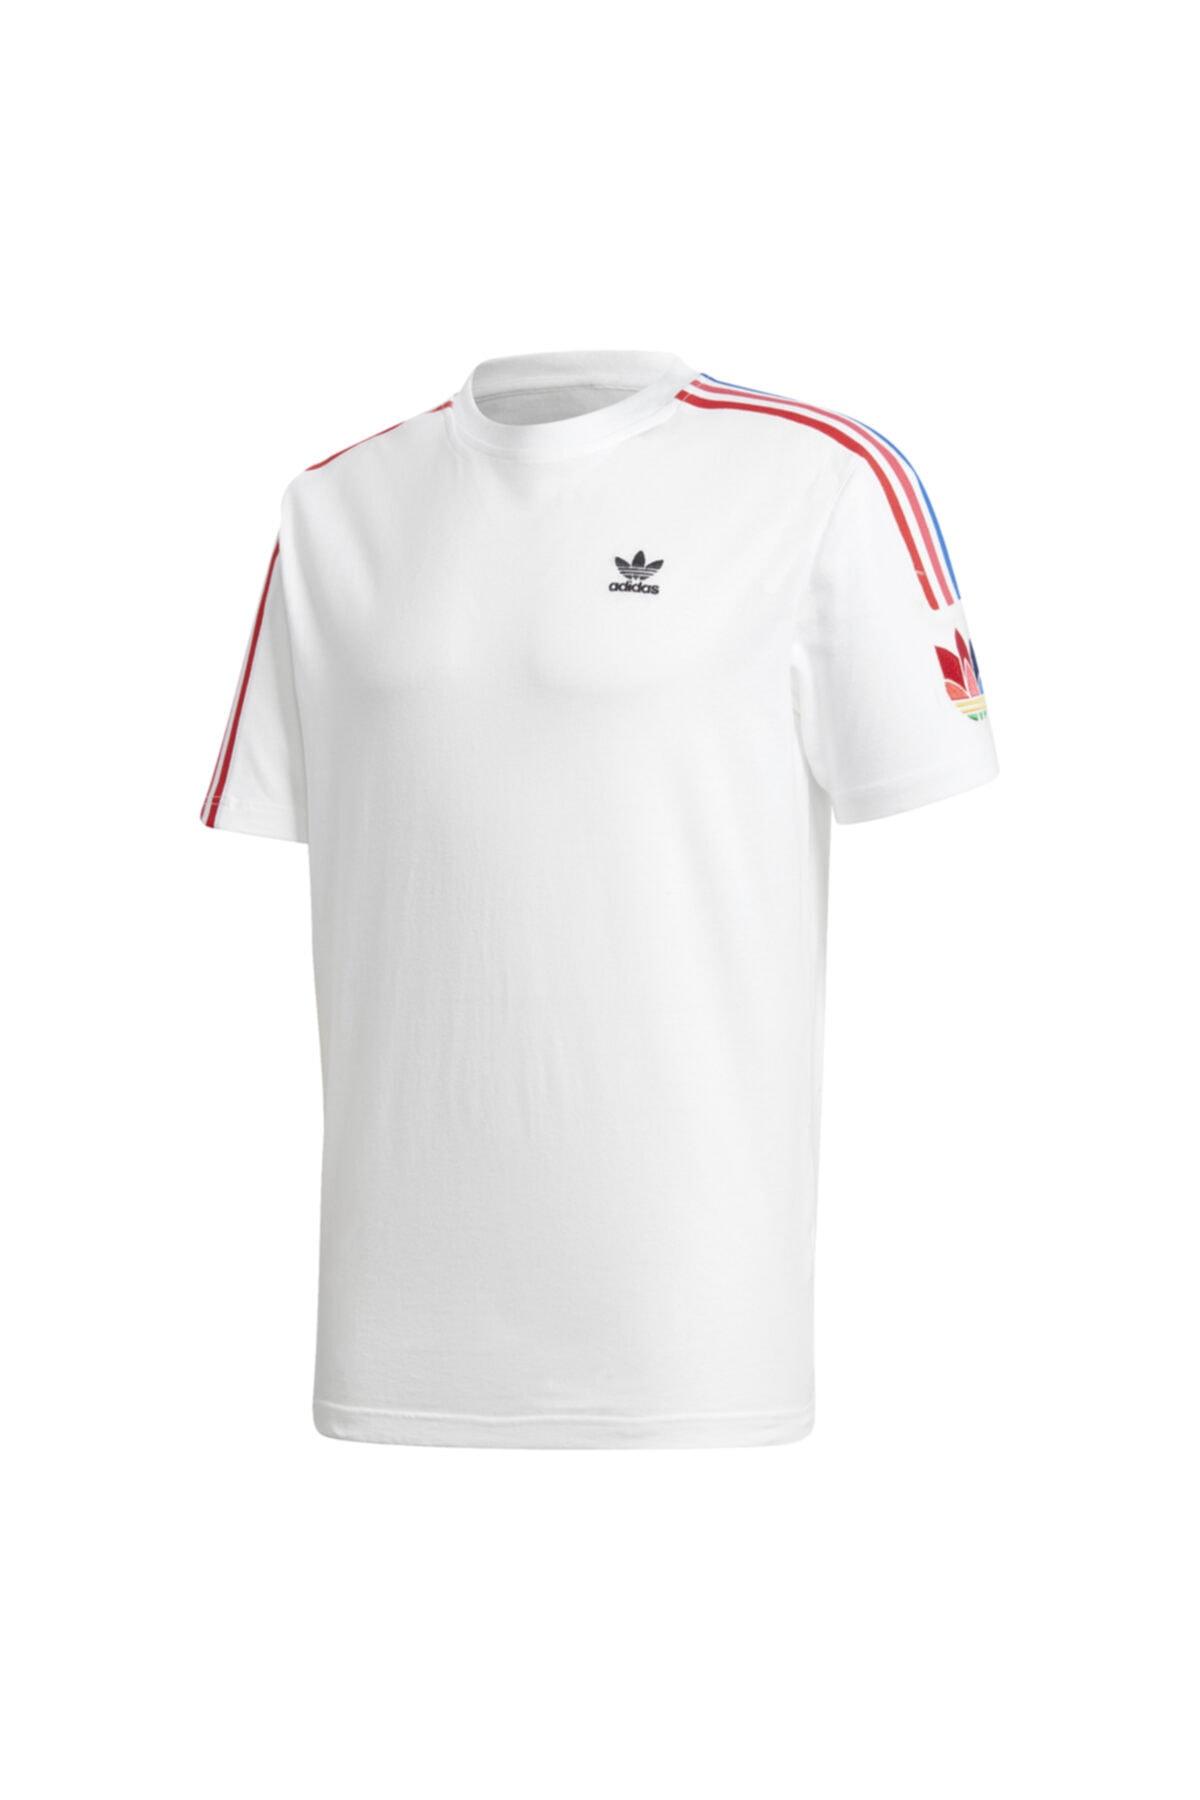 adidas Erkek Beyaz Spor T-Shirt 1